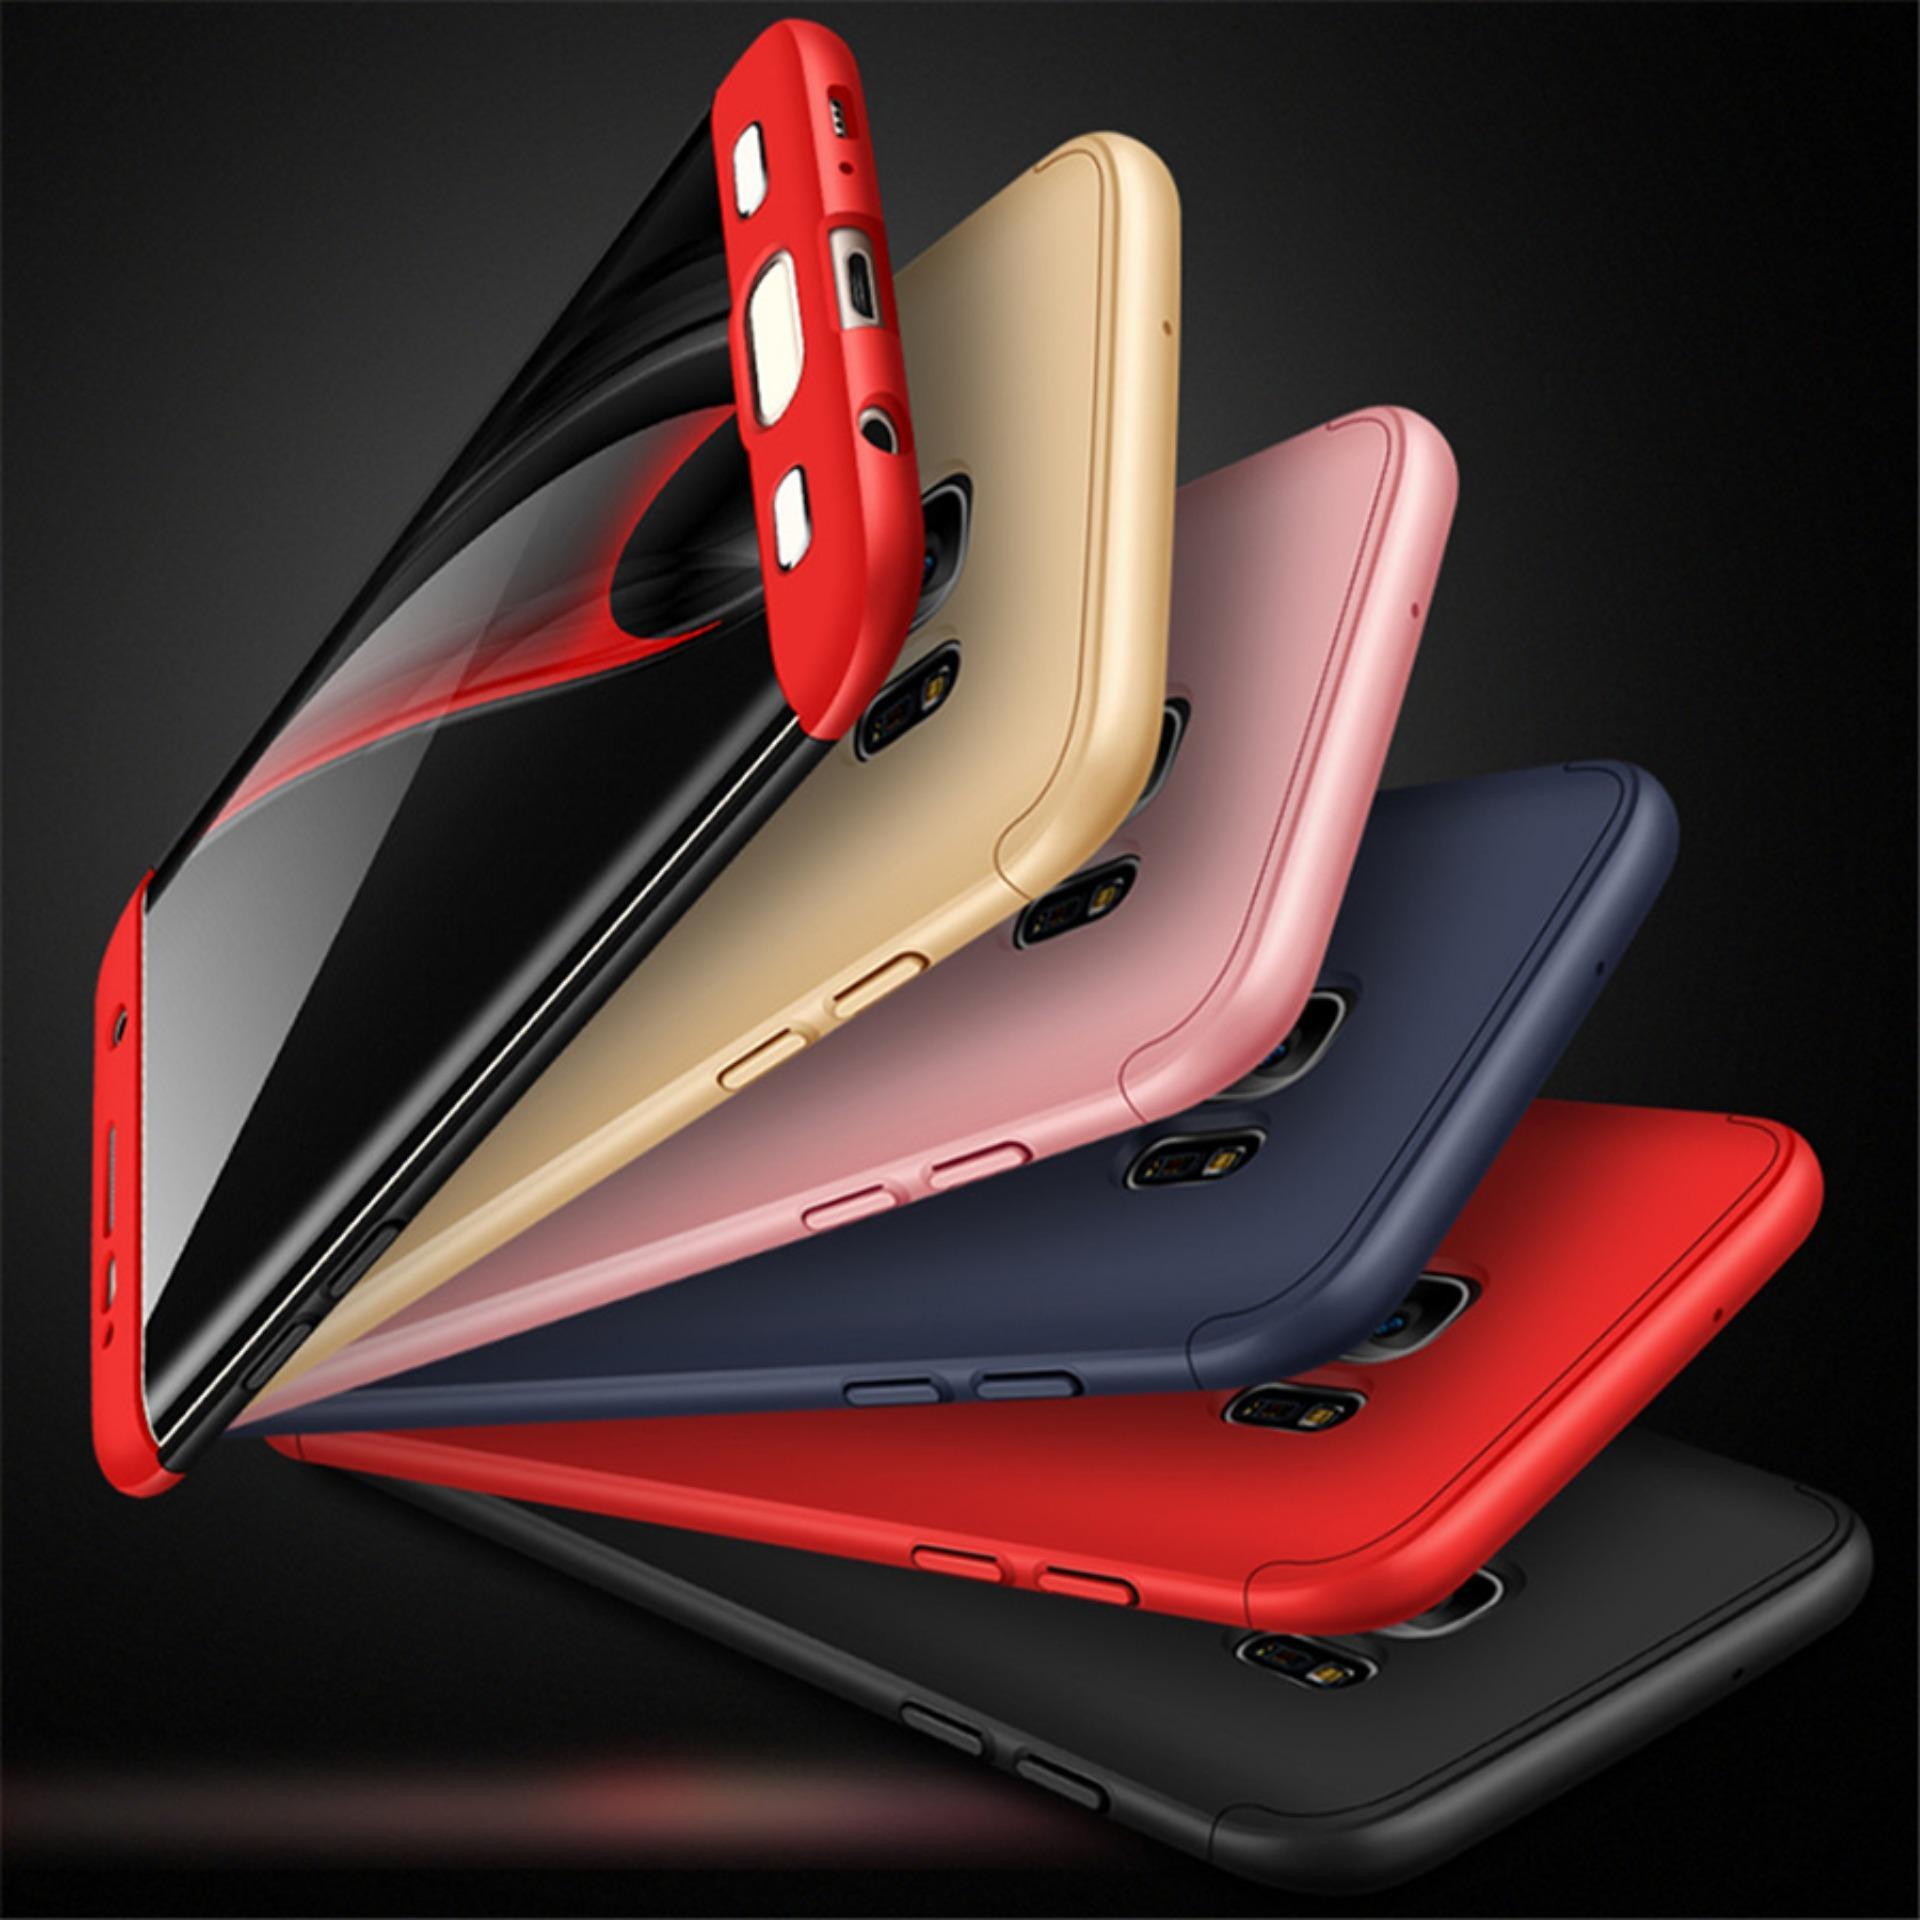 Premium Case 360 Degree Full Protection Super Slim Anti Slip Hard Back Case Cover For Oppo Realme C1 - Random Color + Free Tempered Glass - 2